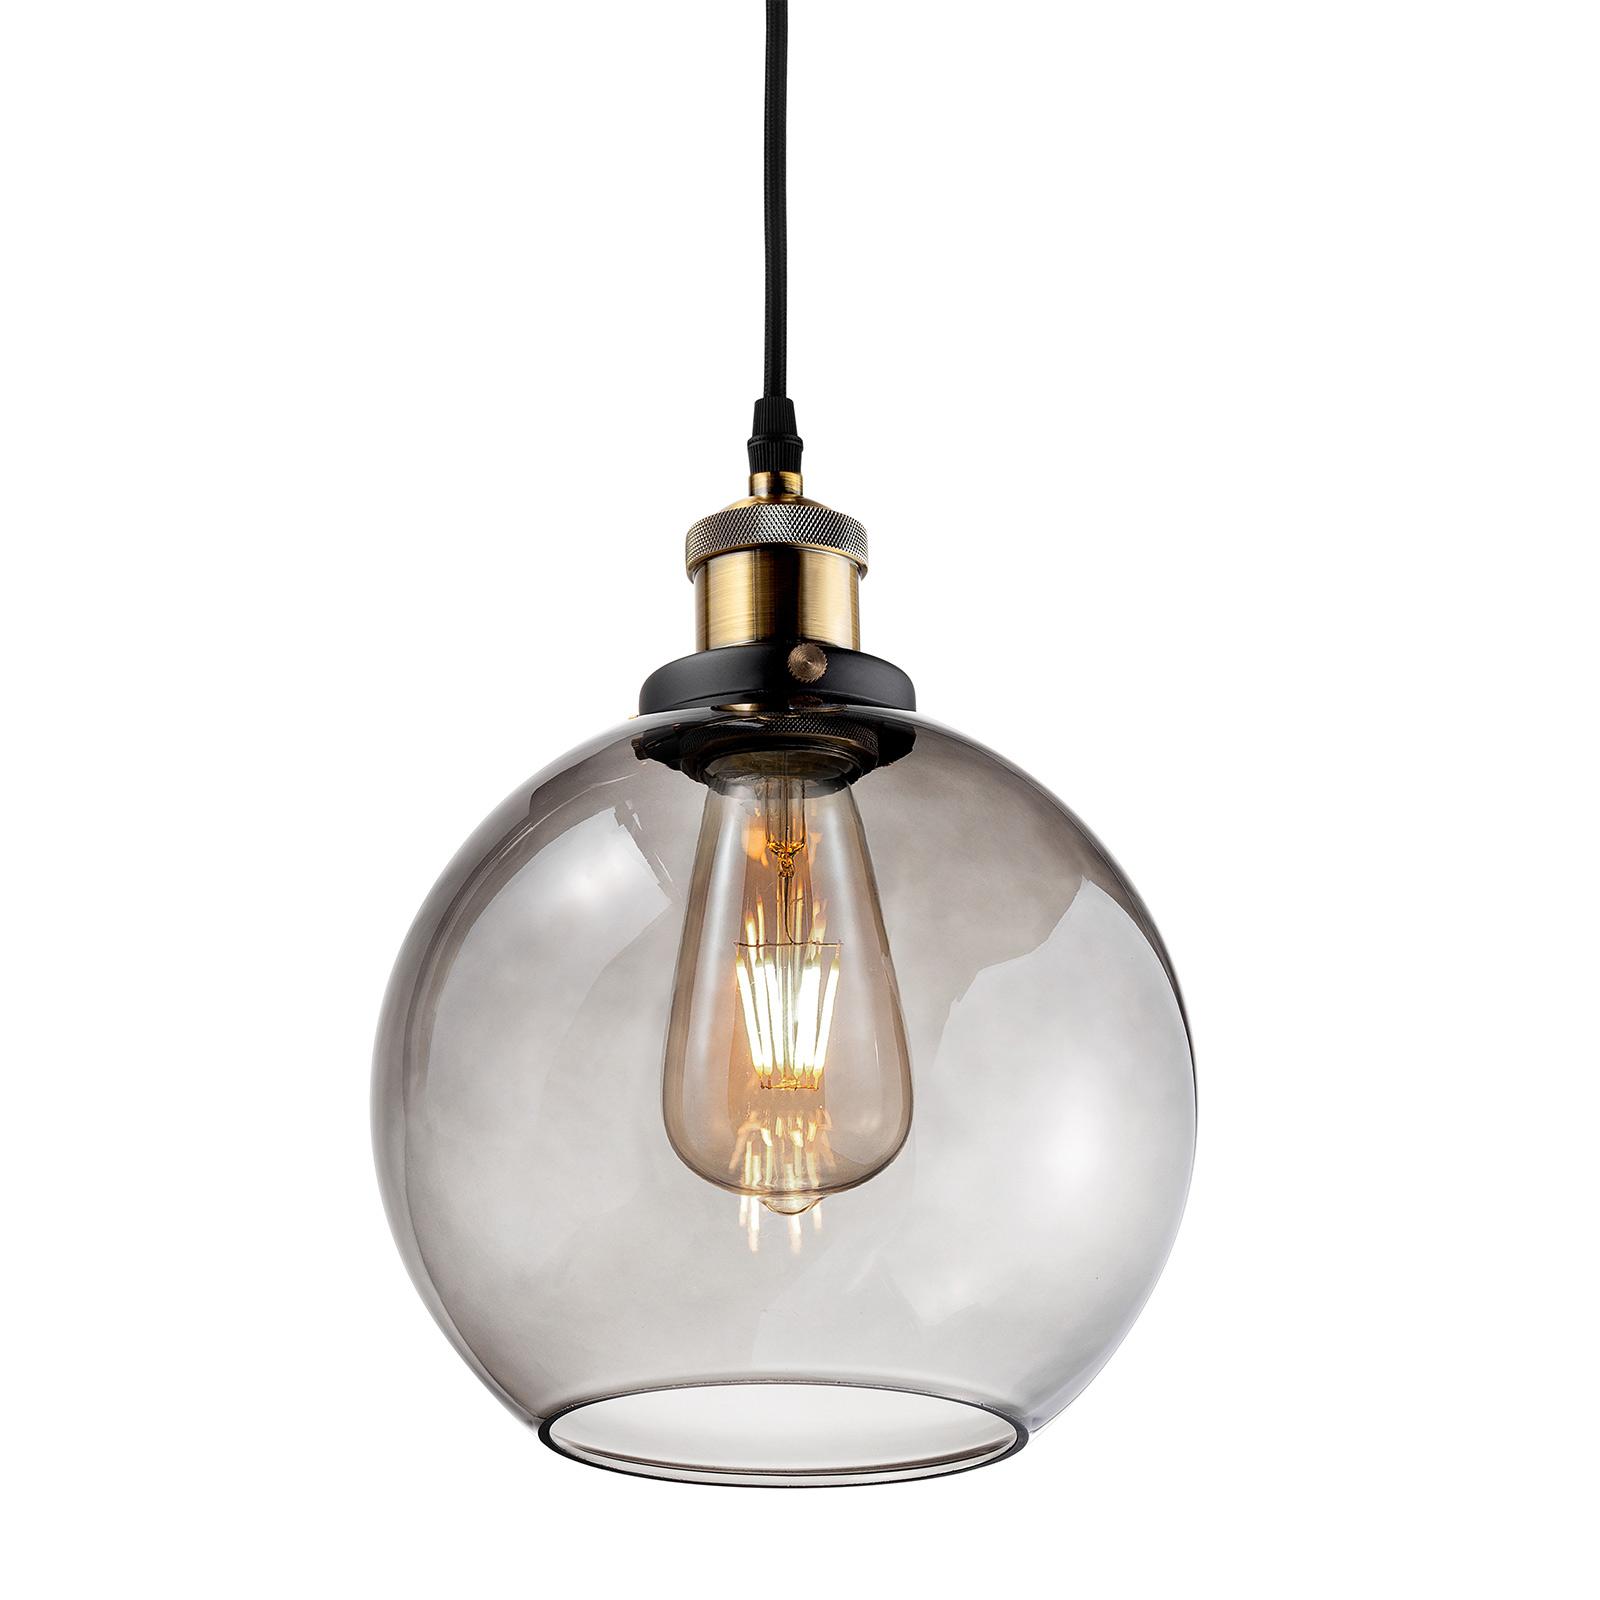 Hanglamp LA035 E27 rond messing/rookgrijs